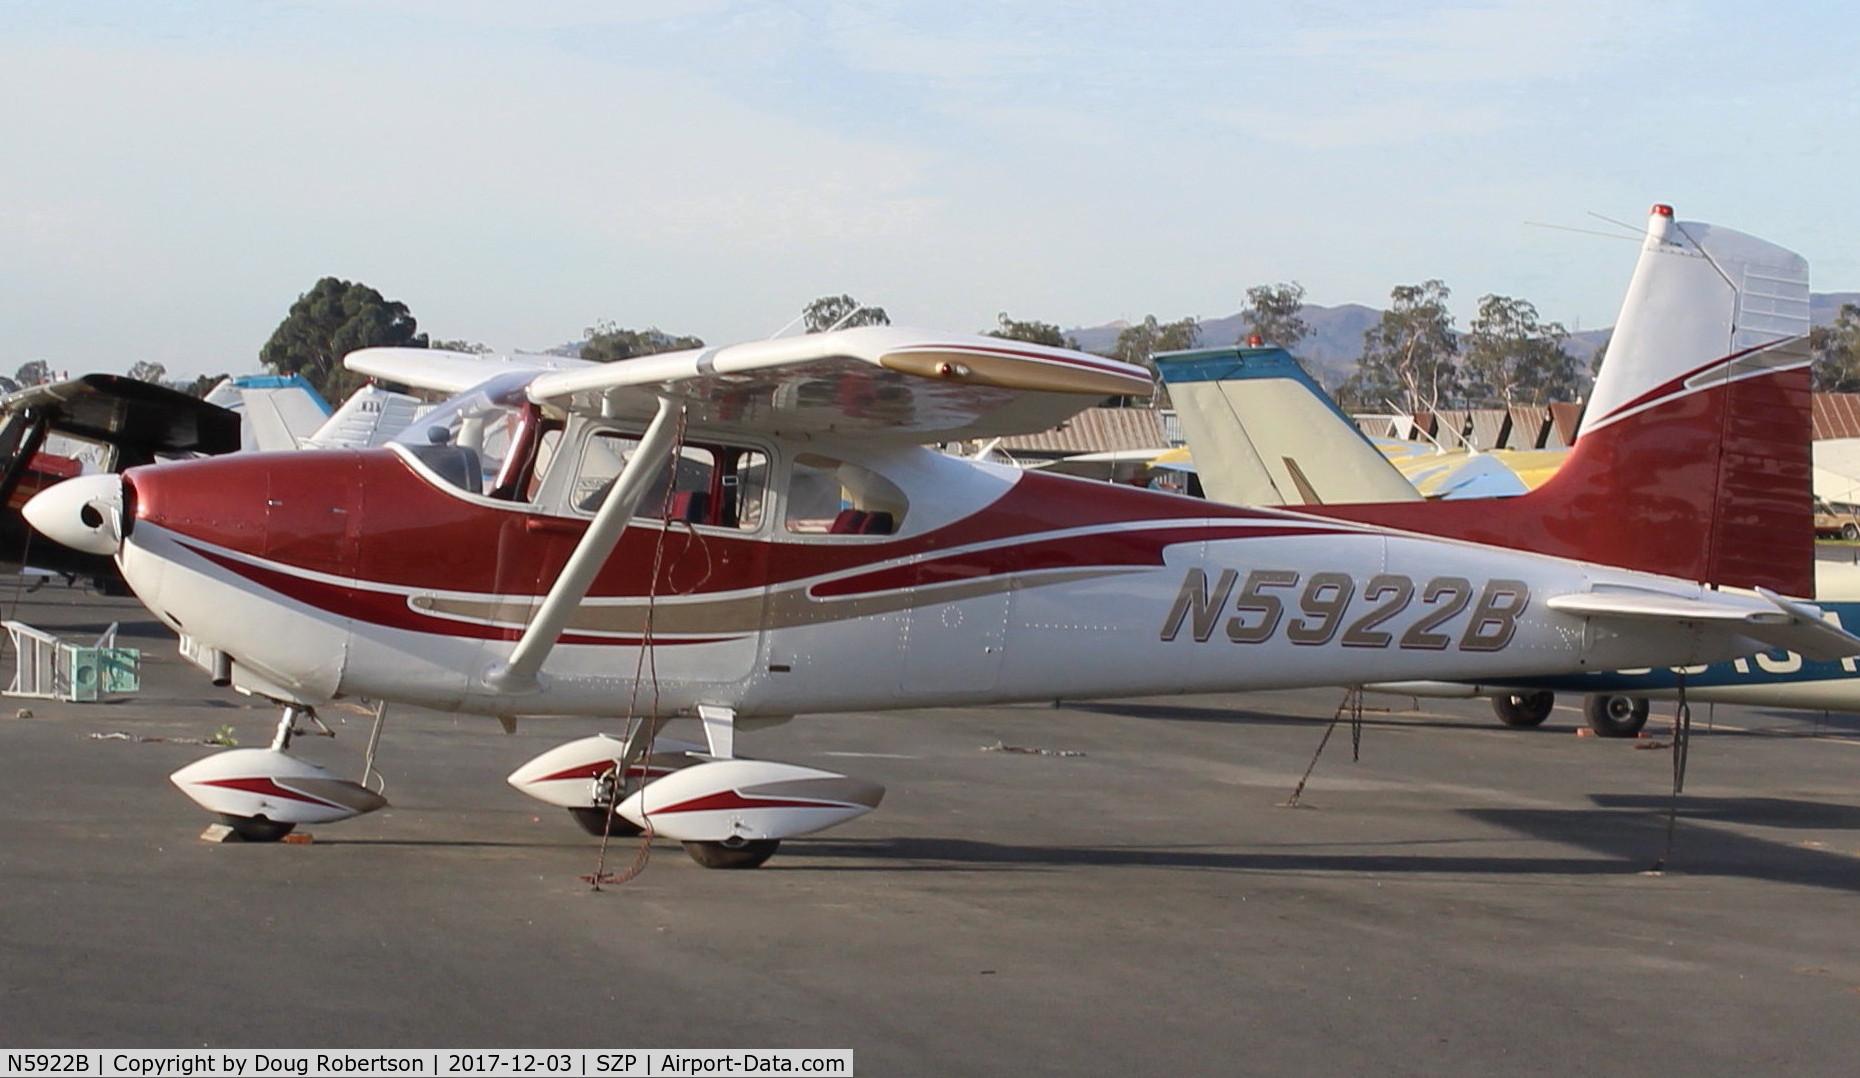 N5922B, 1956 Cessna 182A Skylane C/N 33922, 1956 Cessna 182A SKYLANE, Continental 470-S 230 Hp